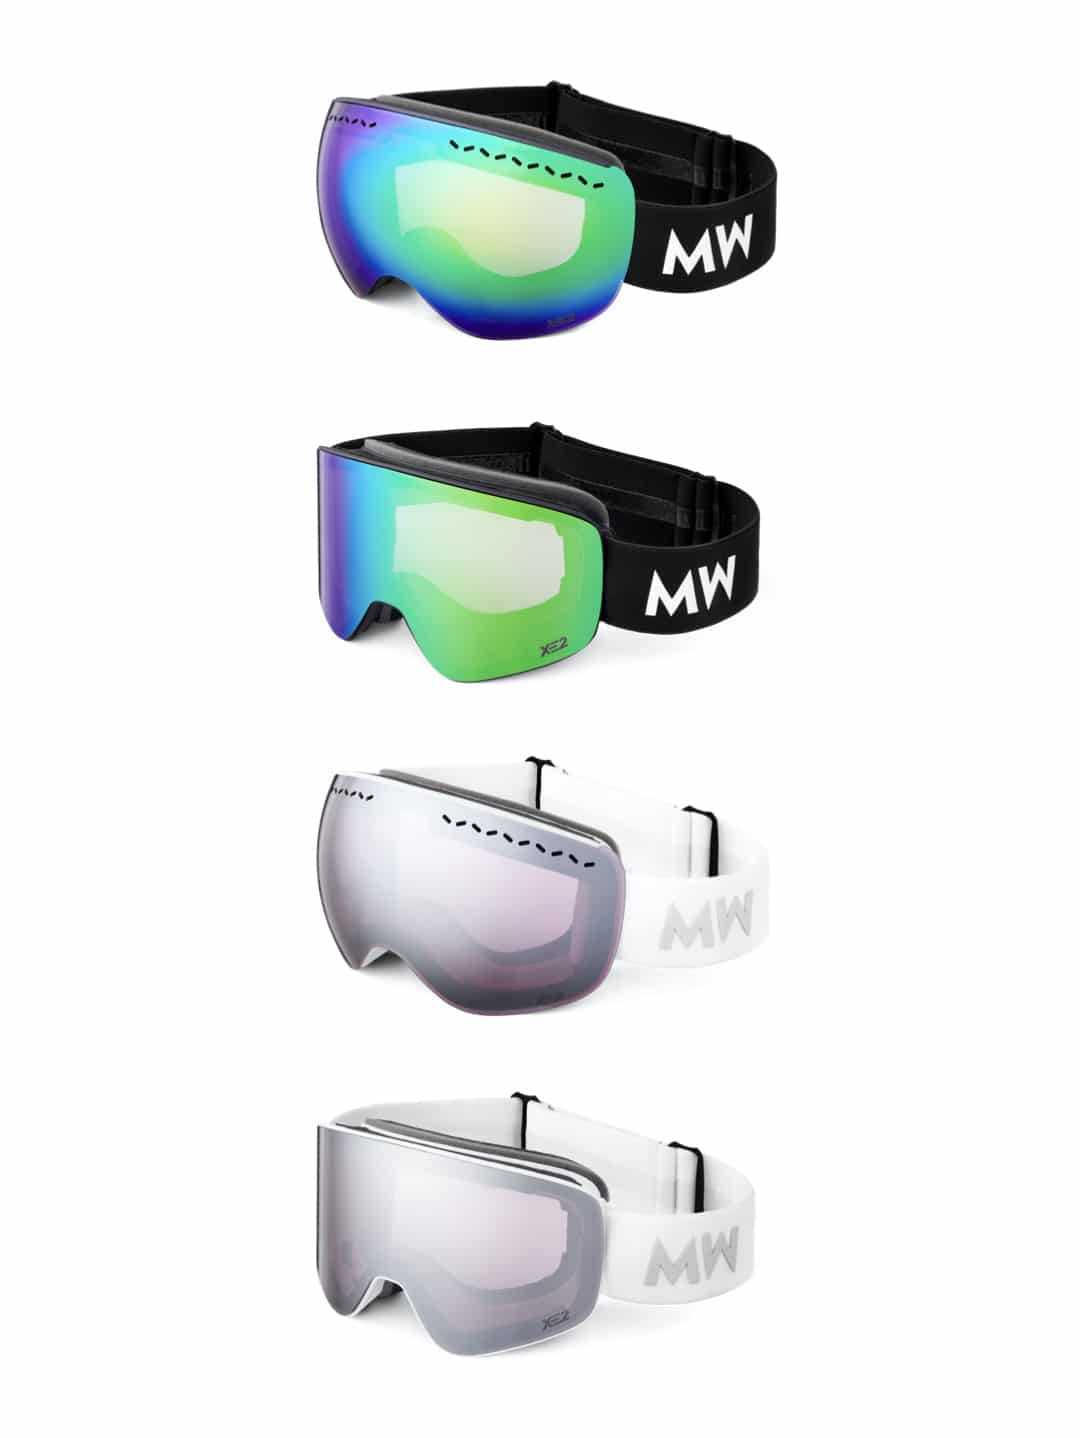 MessyWeekend cylindrical vs spherical lenses